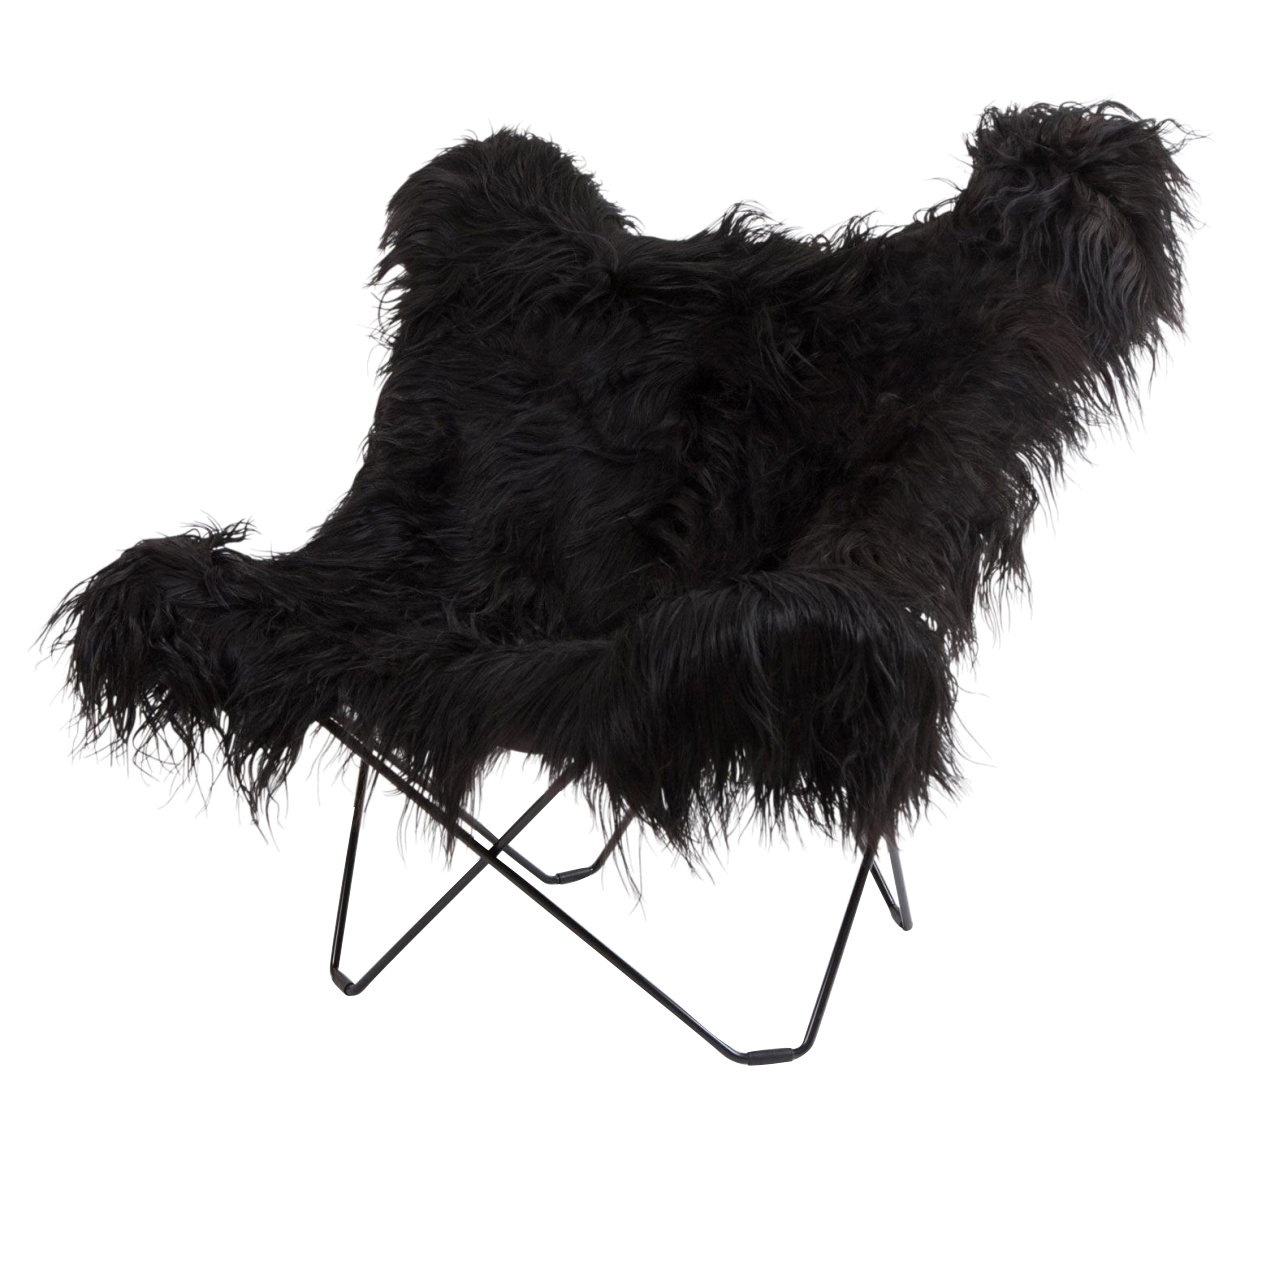 cuero - Iceland Mariposa Butterfly Chair - Fauteuil - noir/agneau islandais Wild Black/structure noir